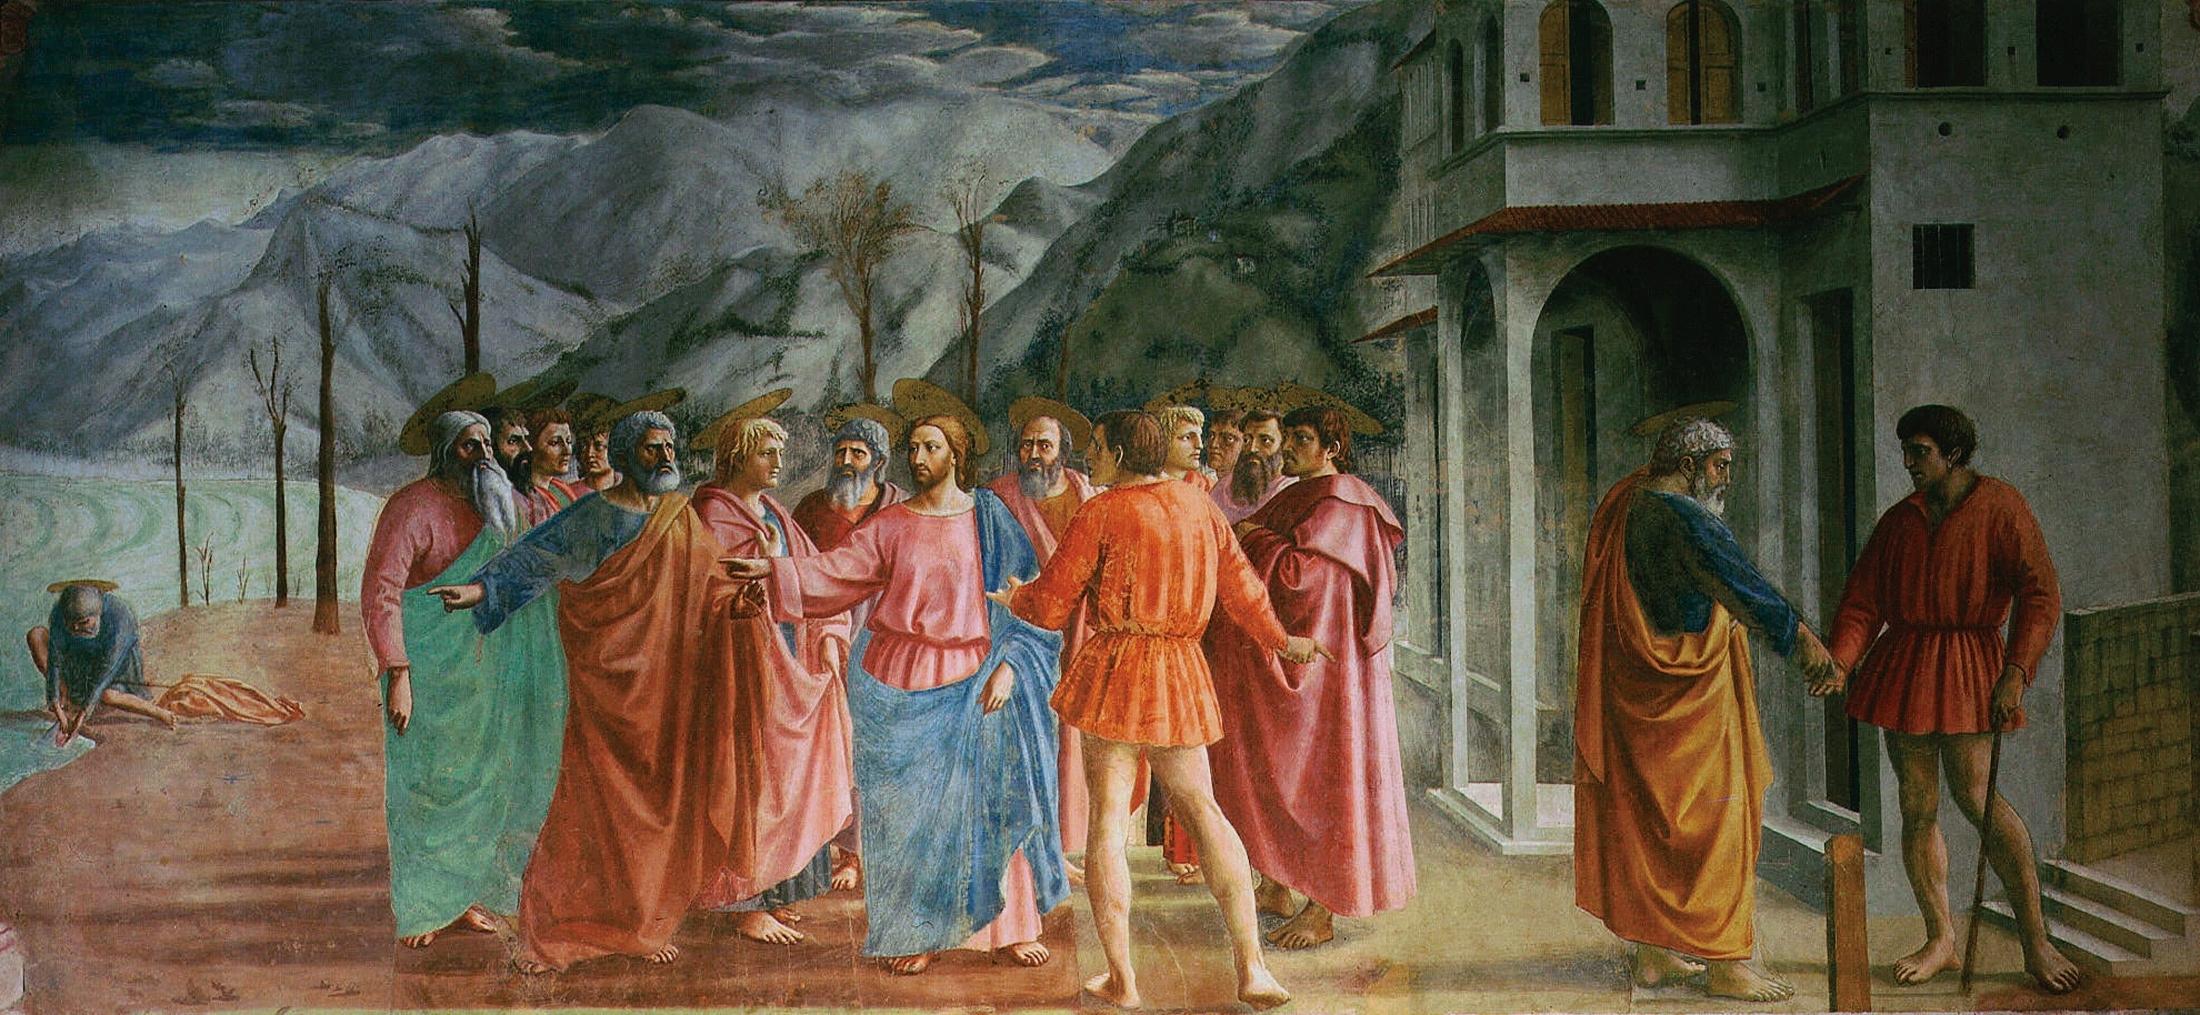 Masaccio7.jpg